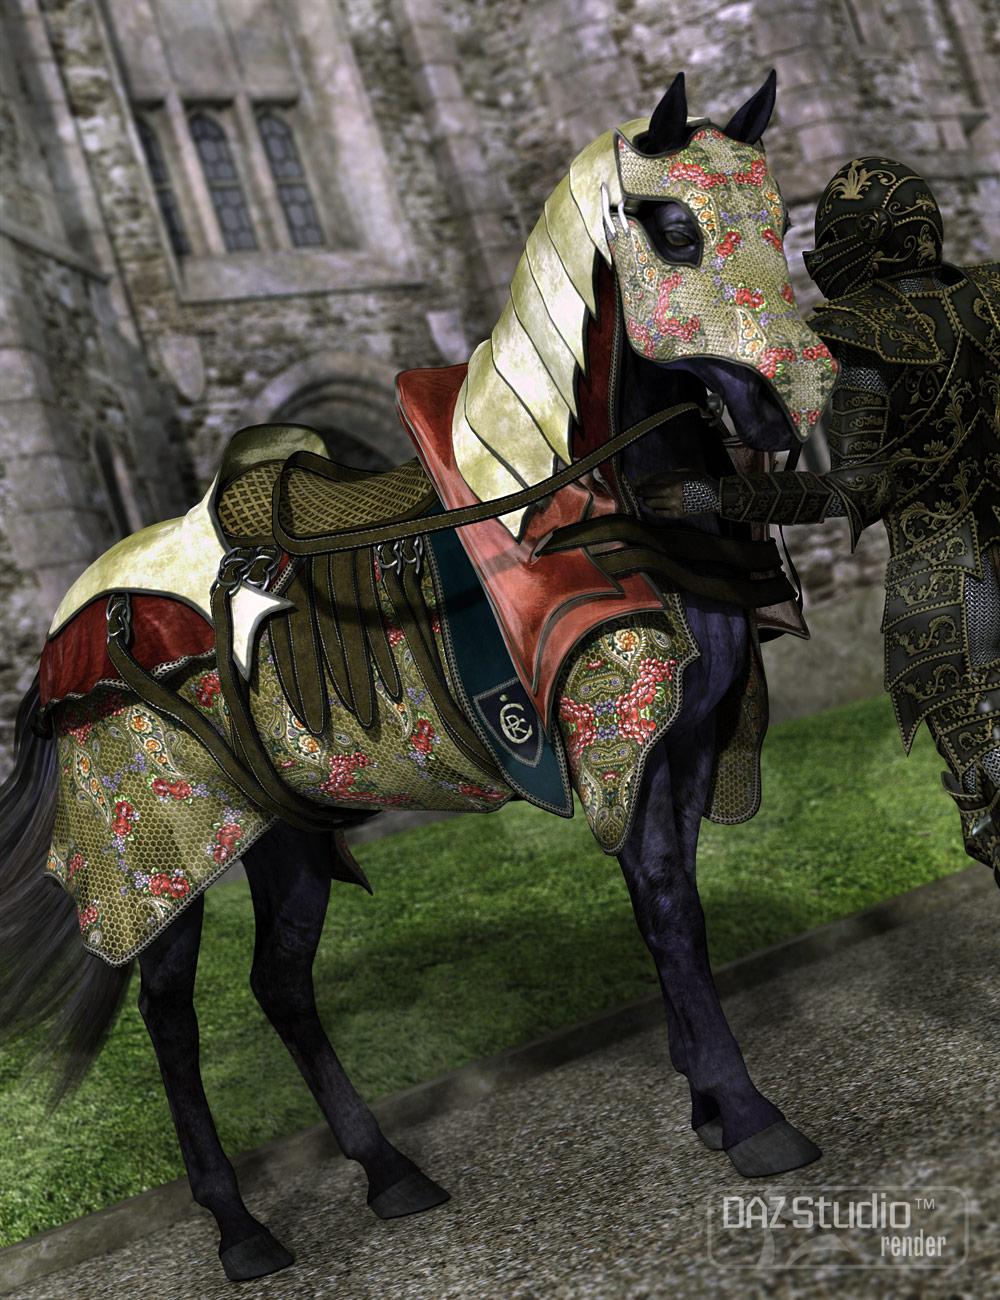 Ceremonial Horse Armor by: Barbara BrundonSarsa, 3D Models by Daz 3D